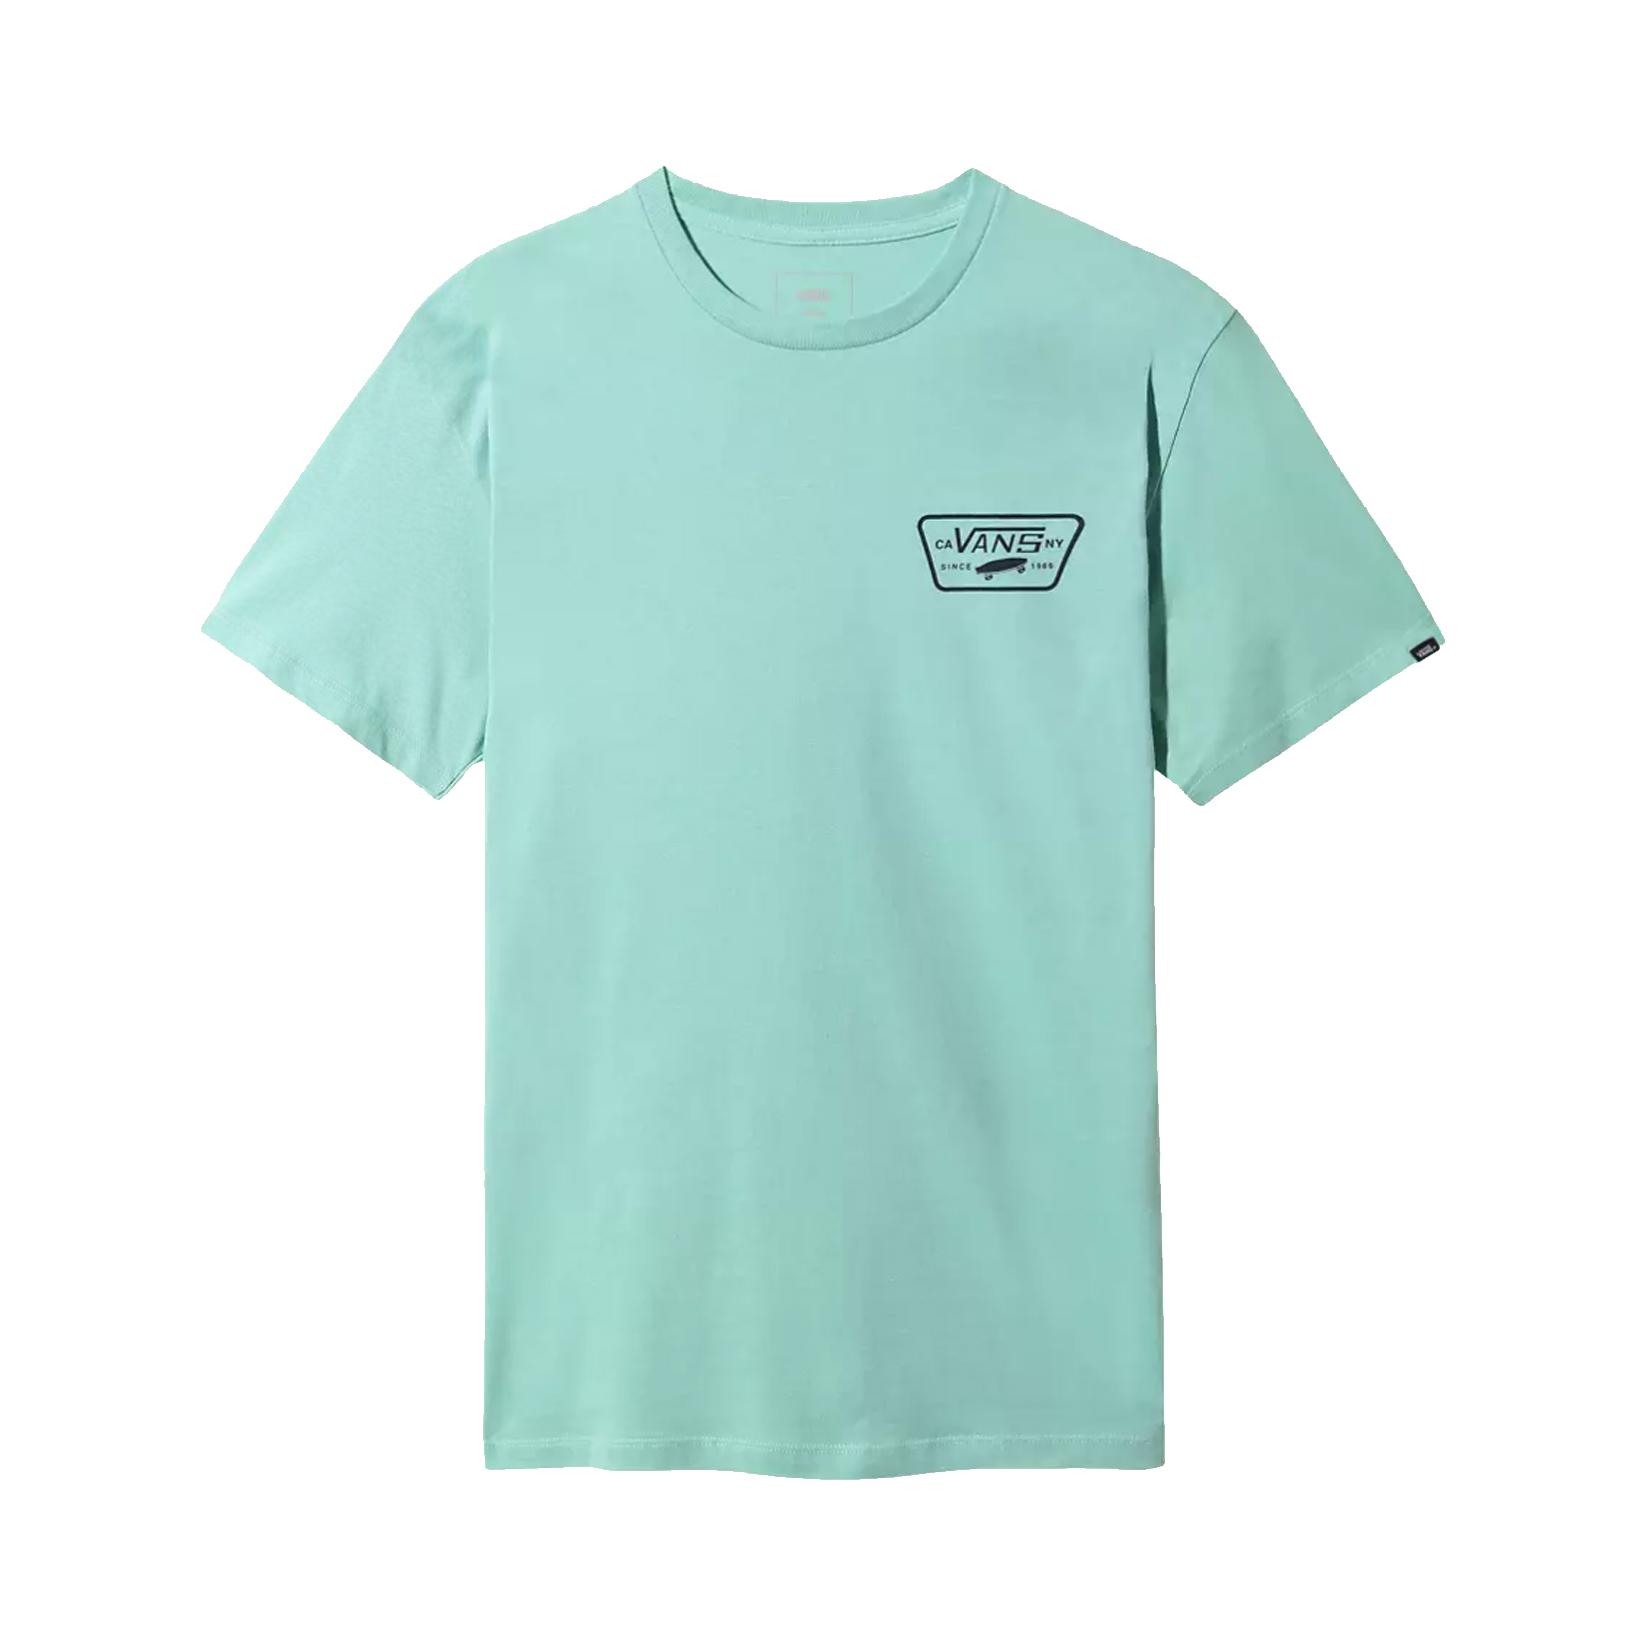 Vans Full Patch Back SS T-Shirt Dusty Jade Green